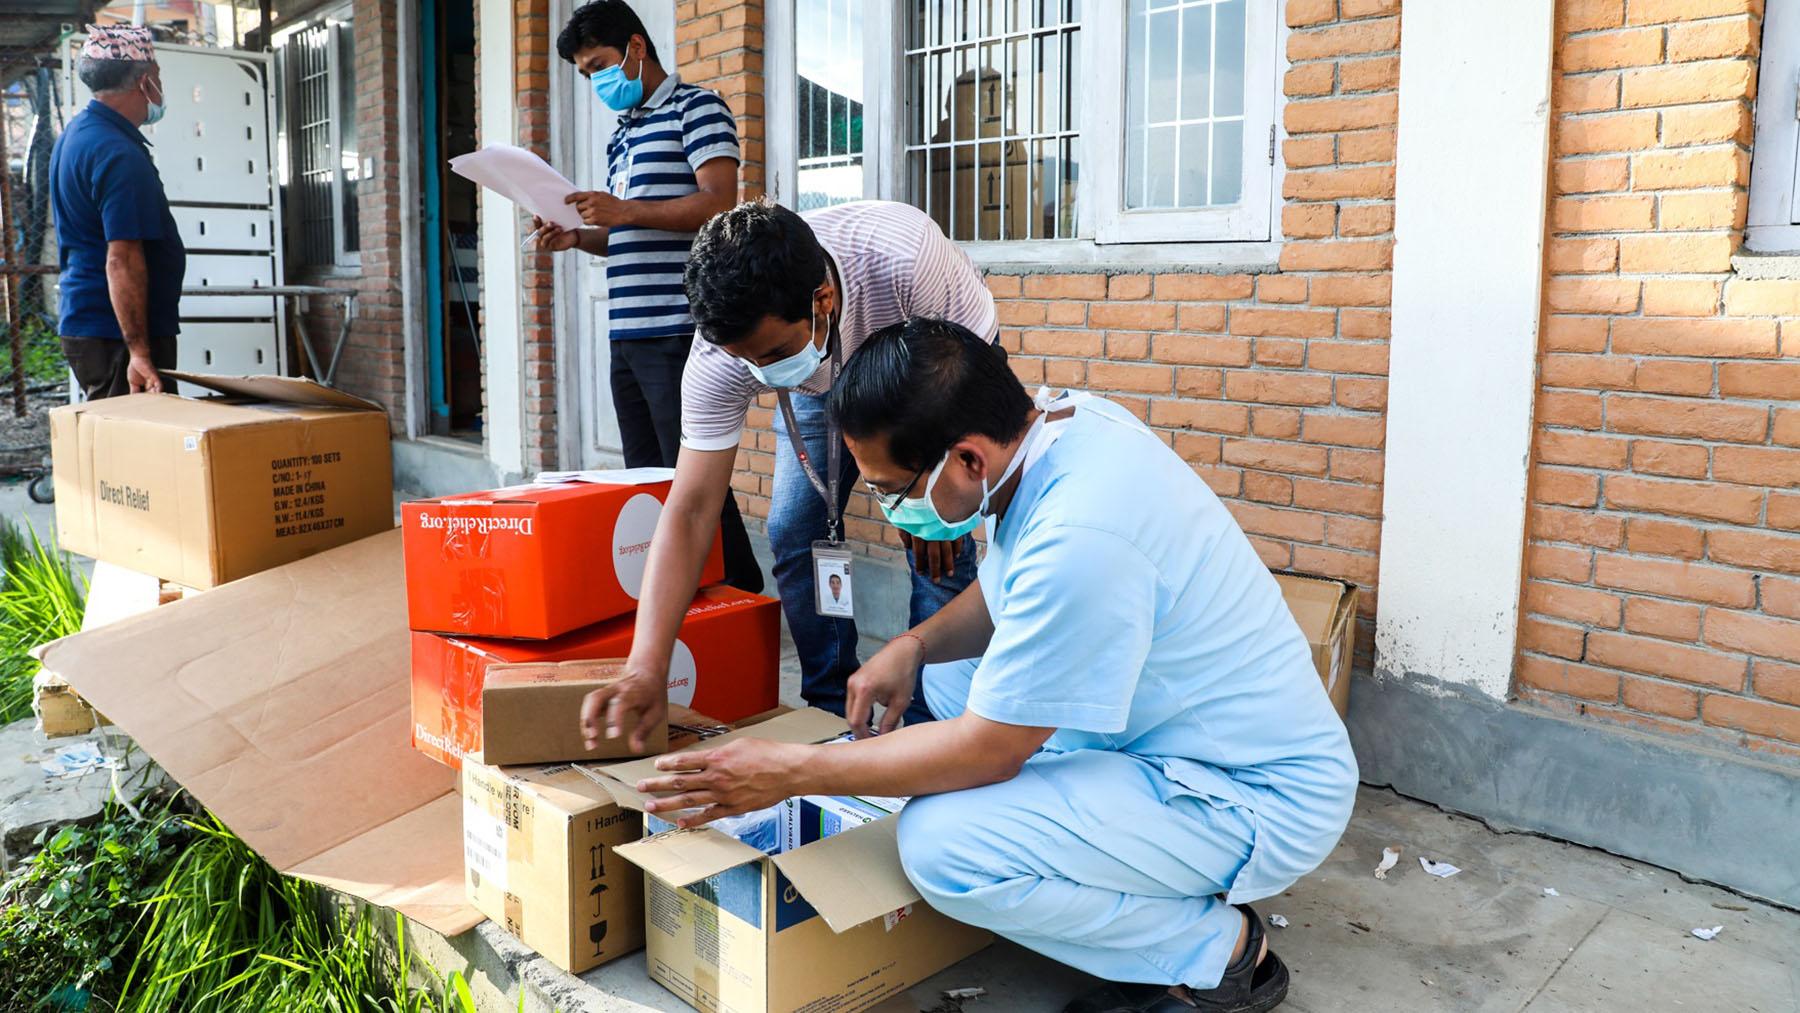 ICU Kits ariving at Dhulikhel Hospital in Nepal during the Covid-19 pandemic. (Photo Courtesy of Pramesh Koju/ Dhulikhel Hospital)